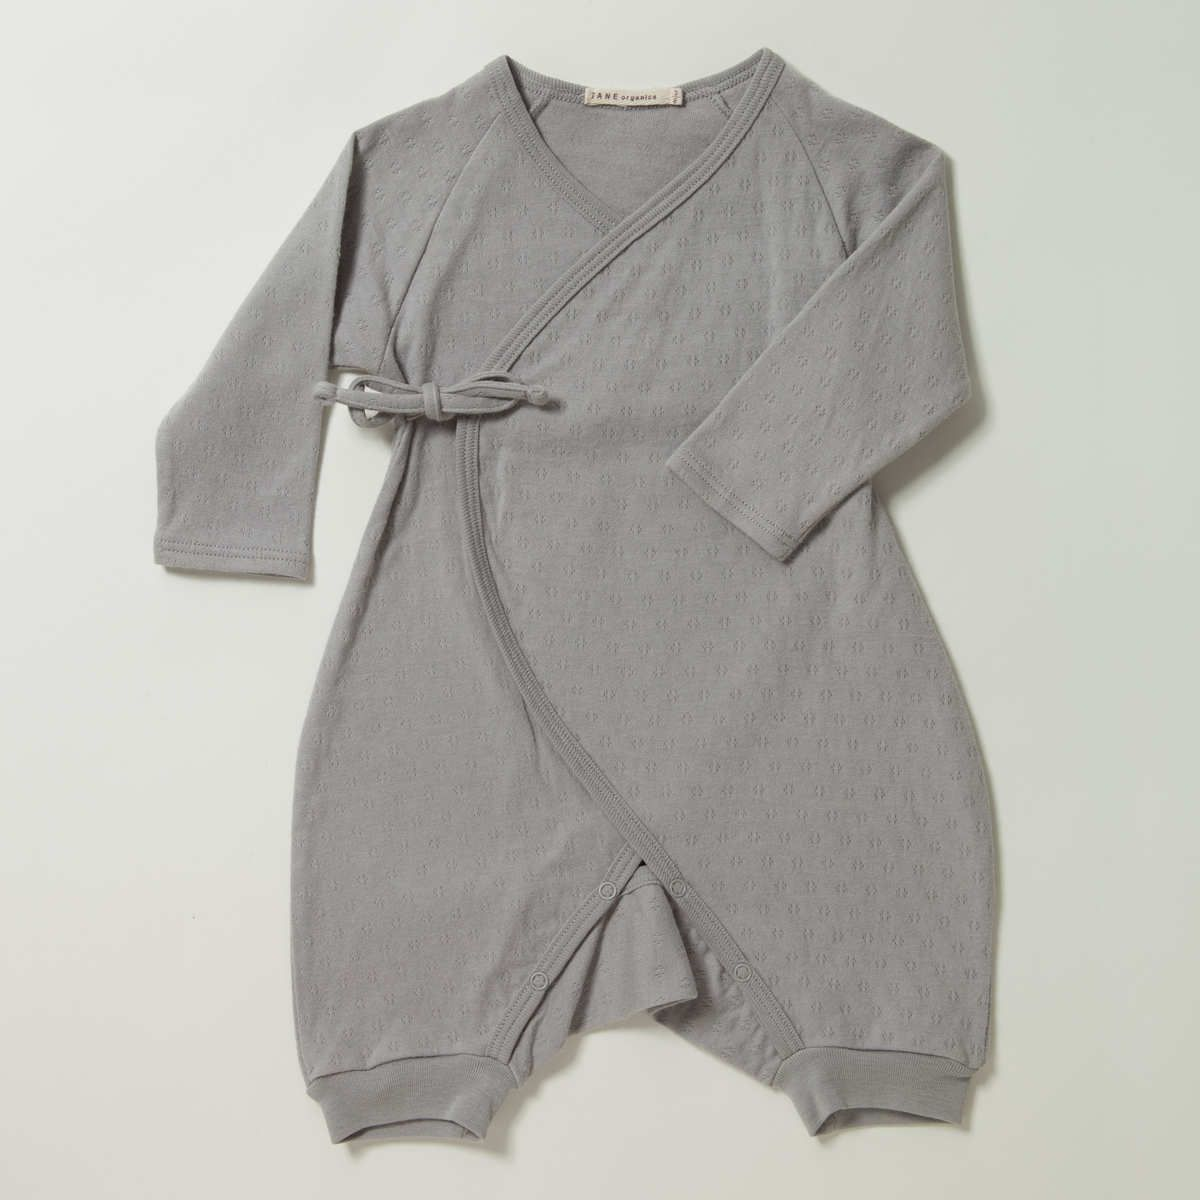 longsleeve pointelle kimono bodysuit w/ leggings  Baby clothes